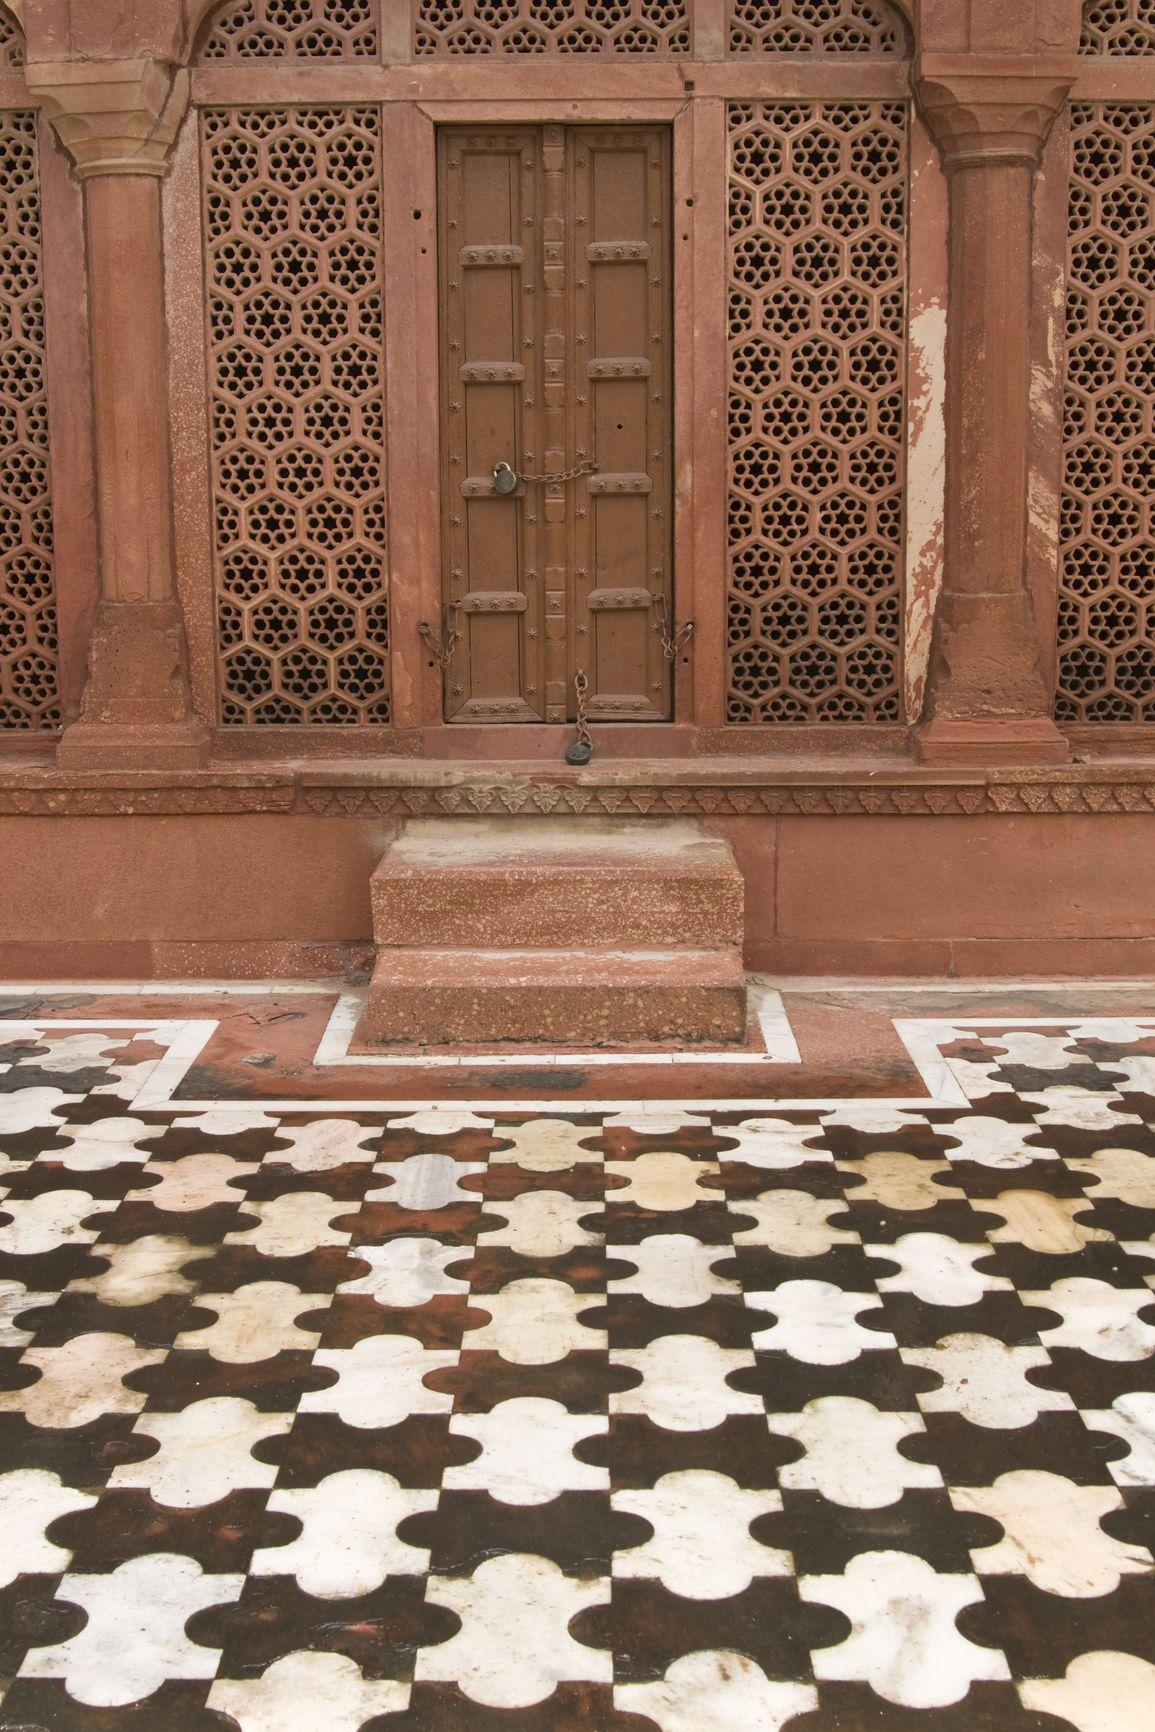 Taj Mahal. Detail of red sandstone doorway and patterned